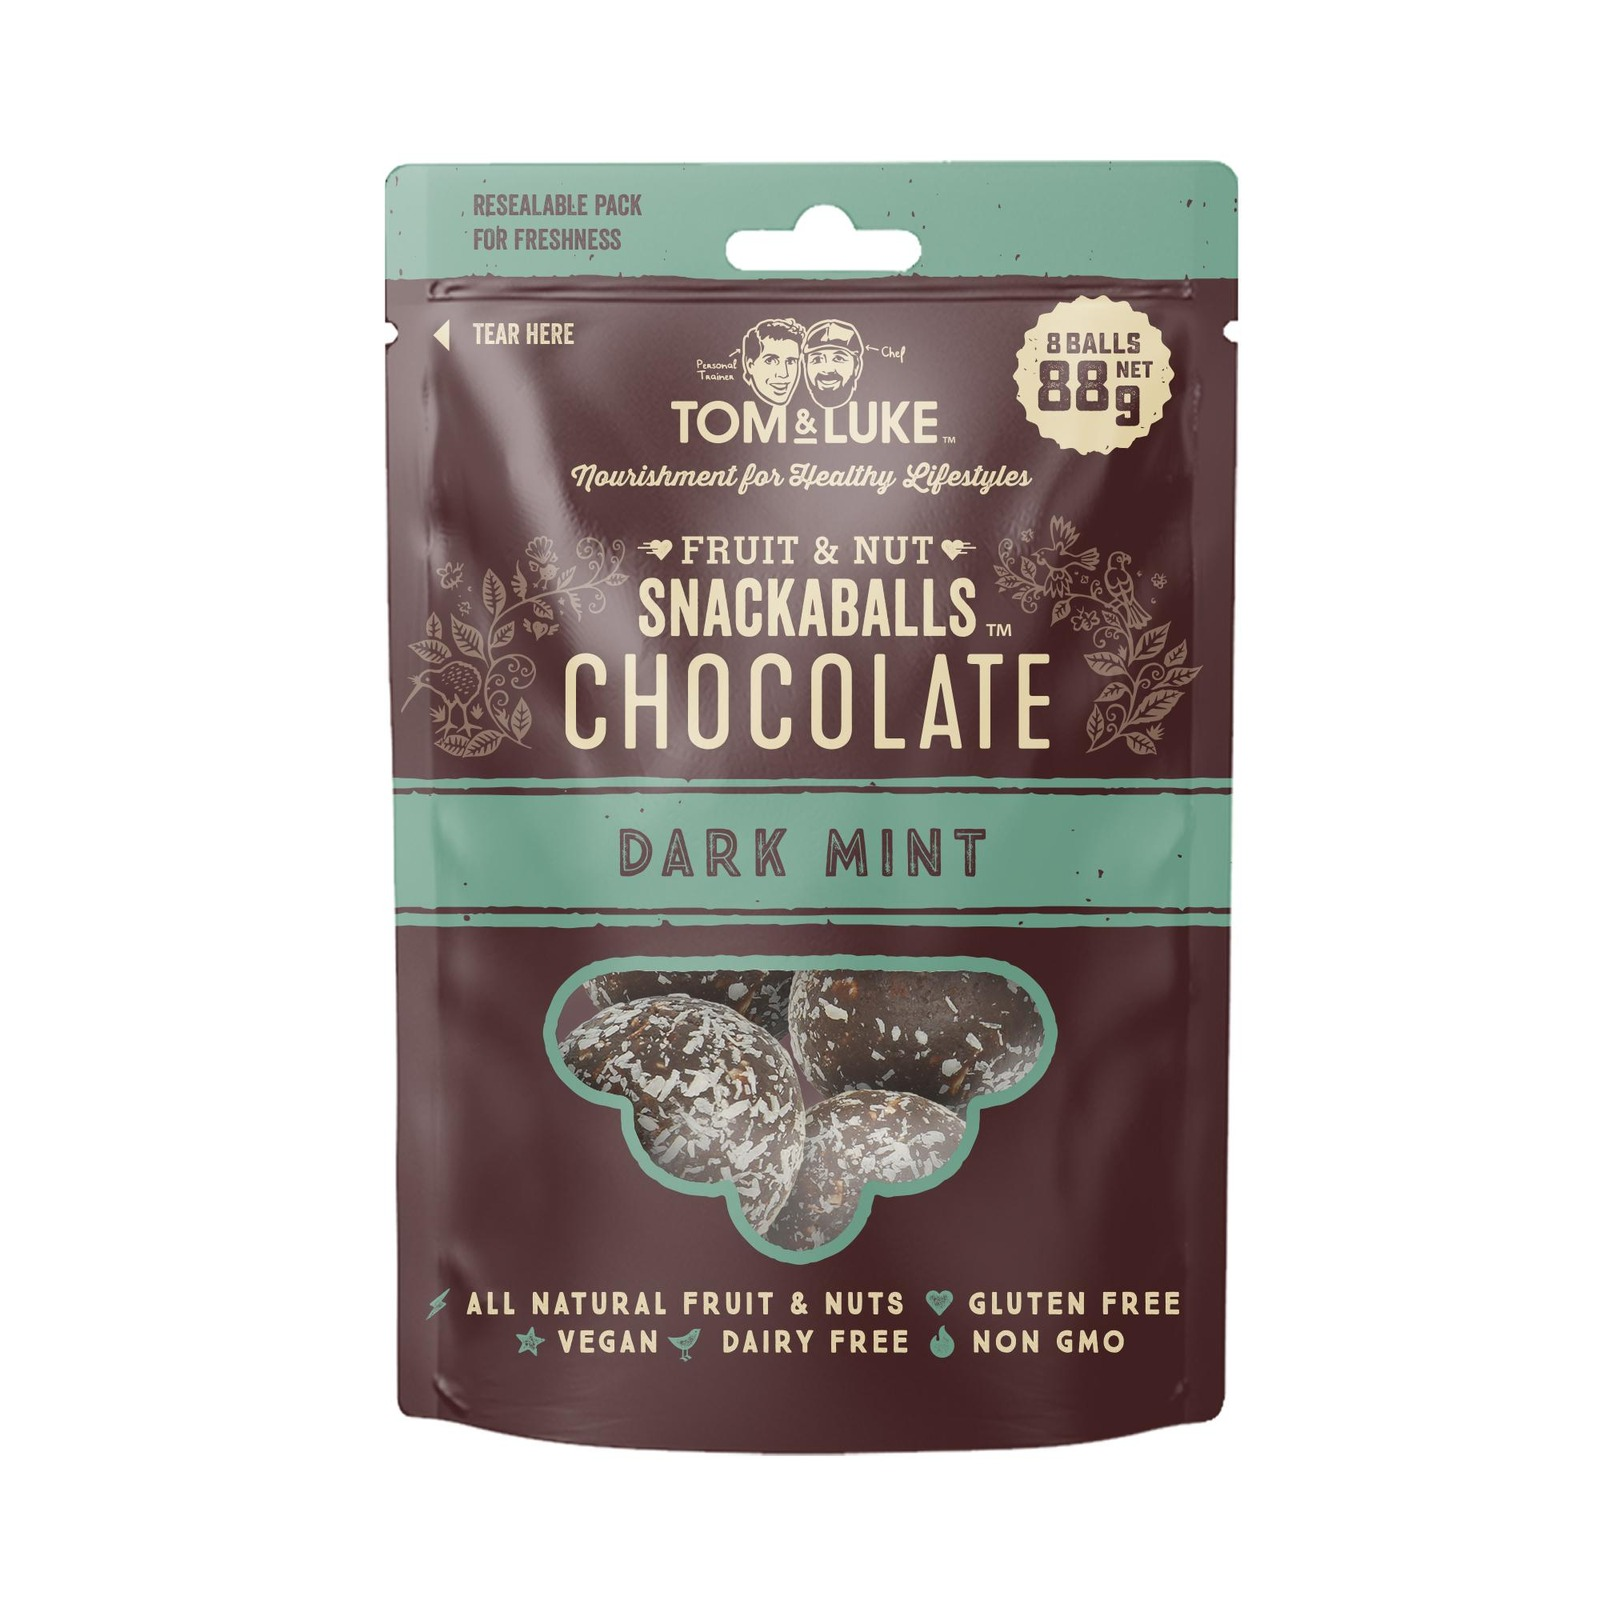 Tom & Luke Snackaball - Dark Chocolate Mint